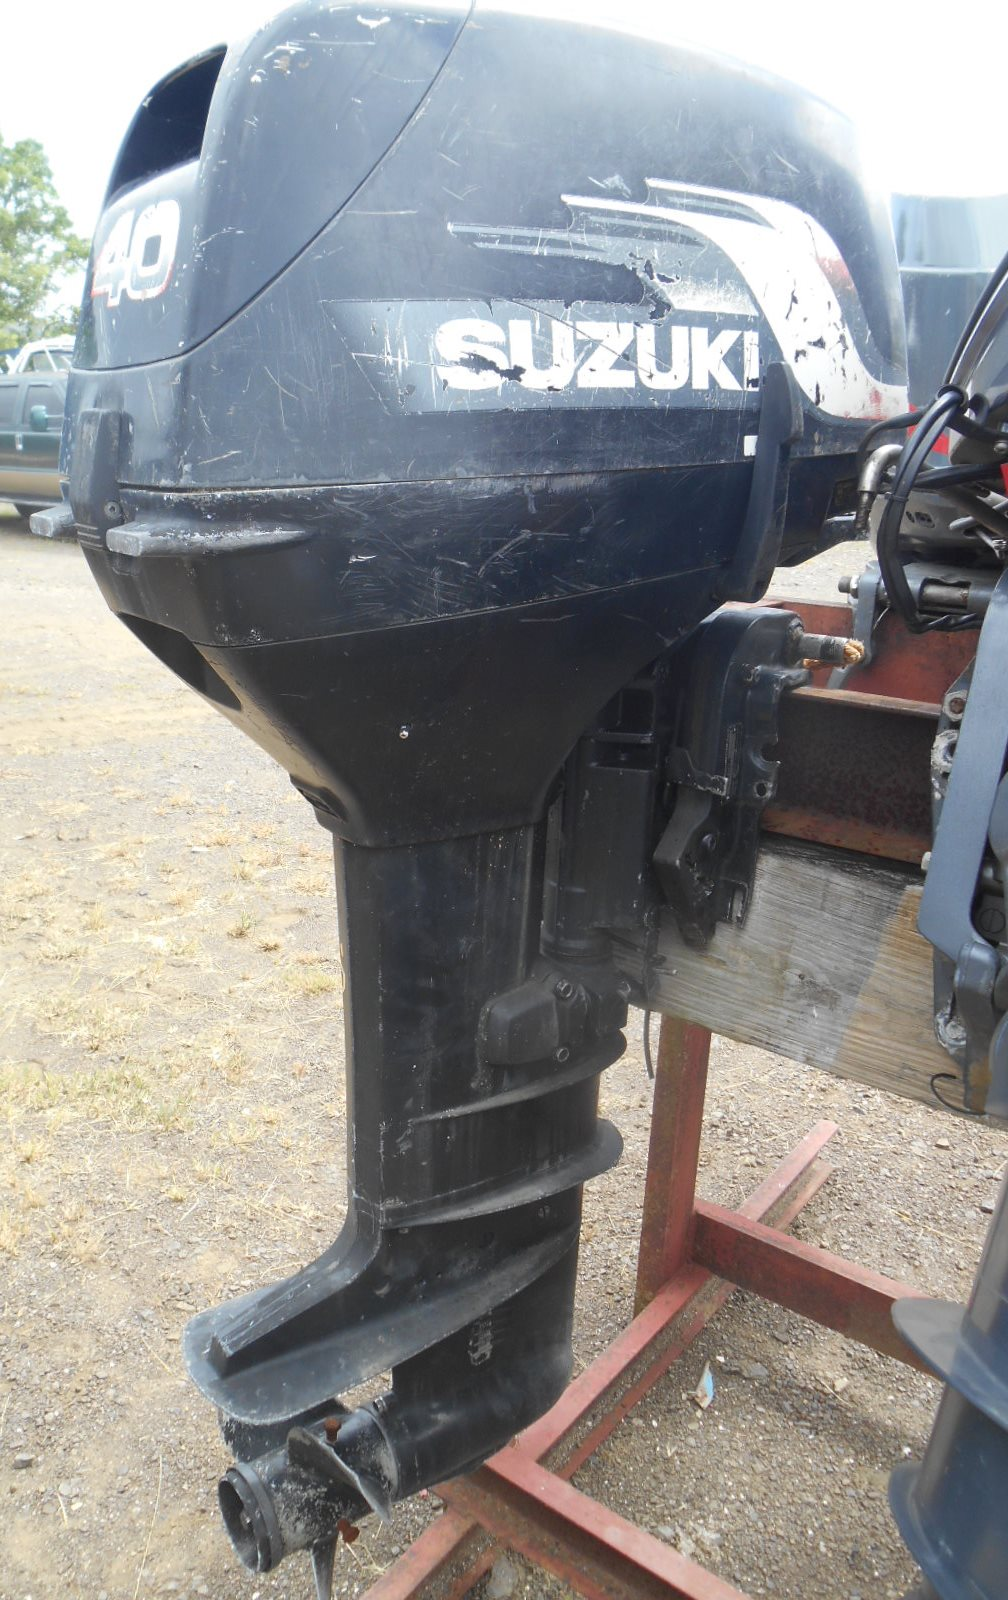 Lot 4 40 HP Suzuki (5)